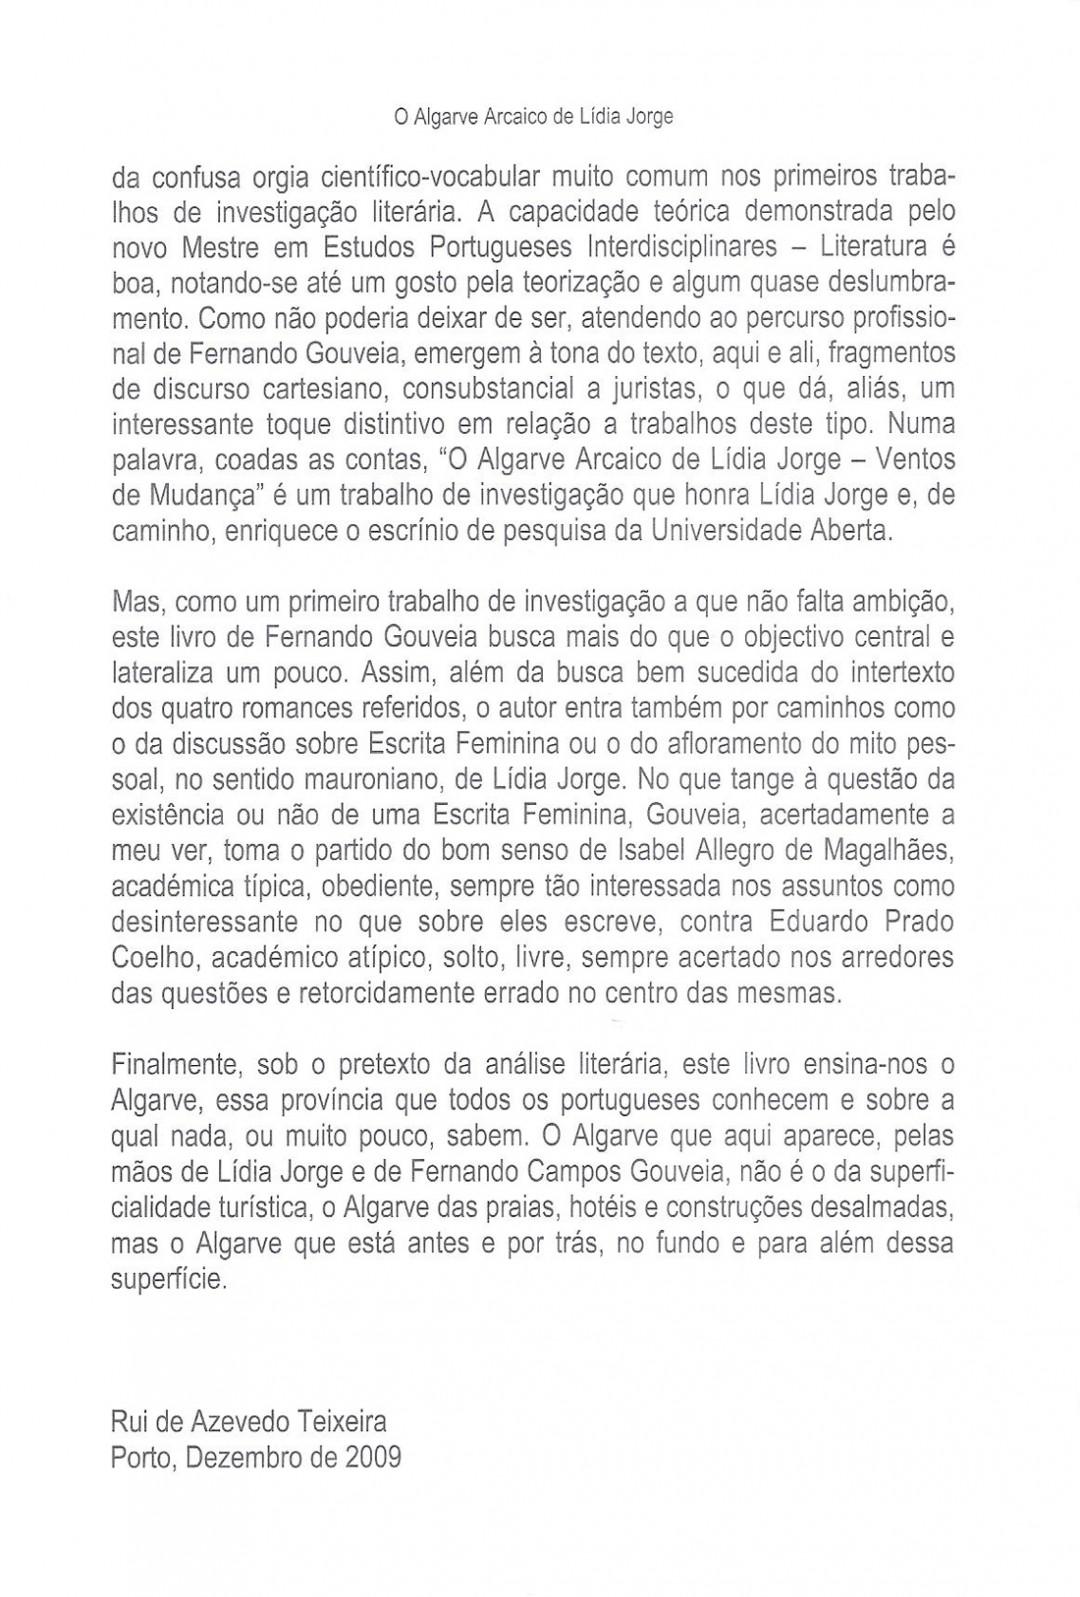 7. O Algarve Arcaico de Lídia Jorge